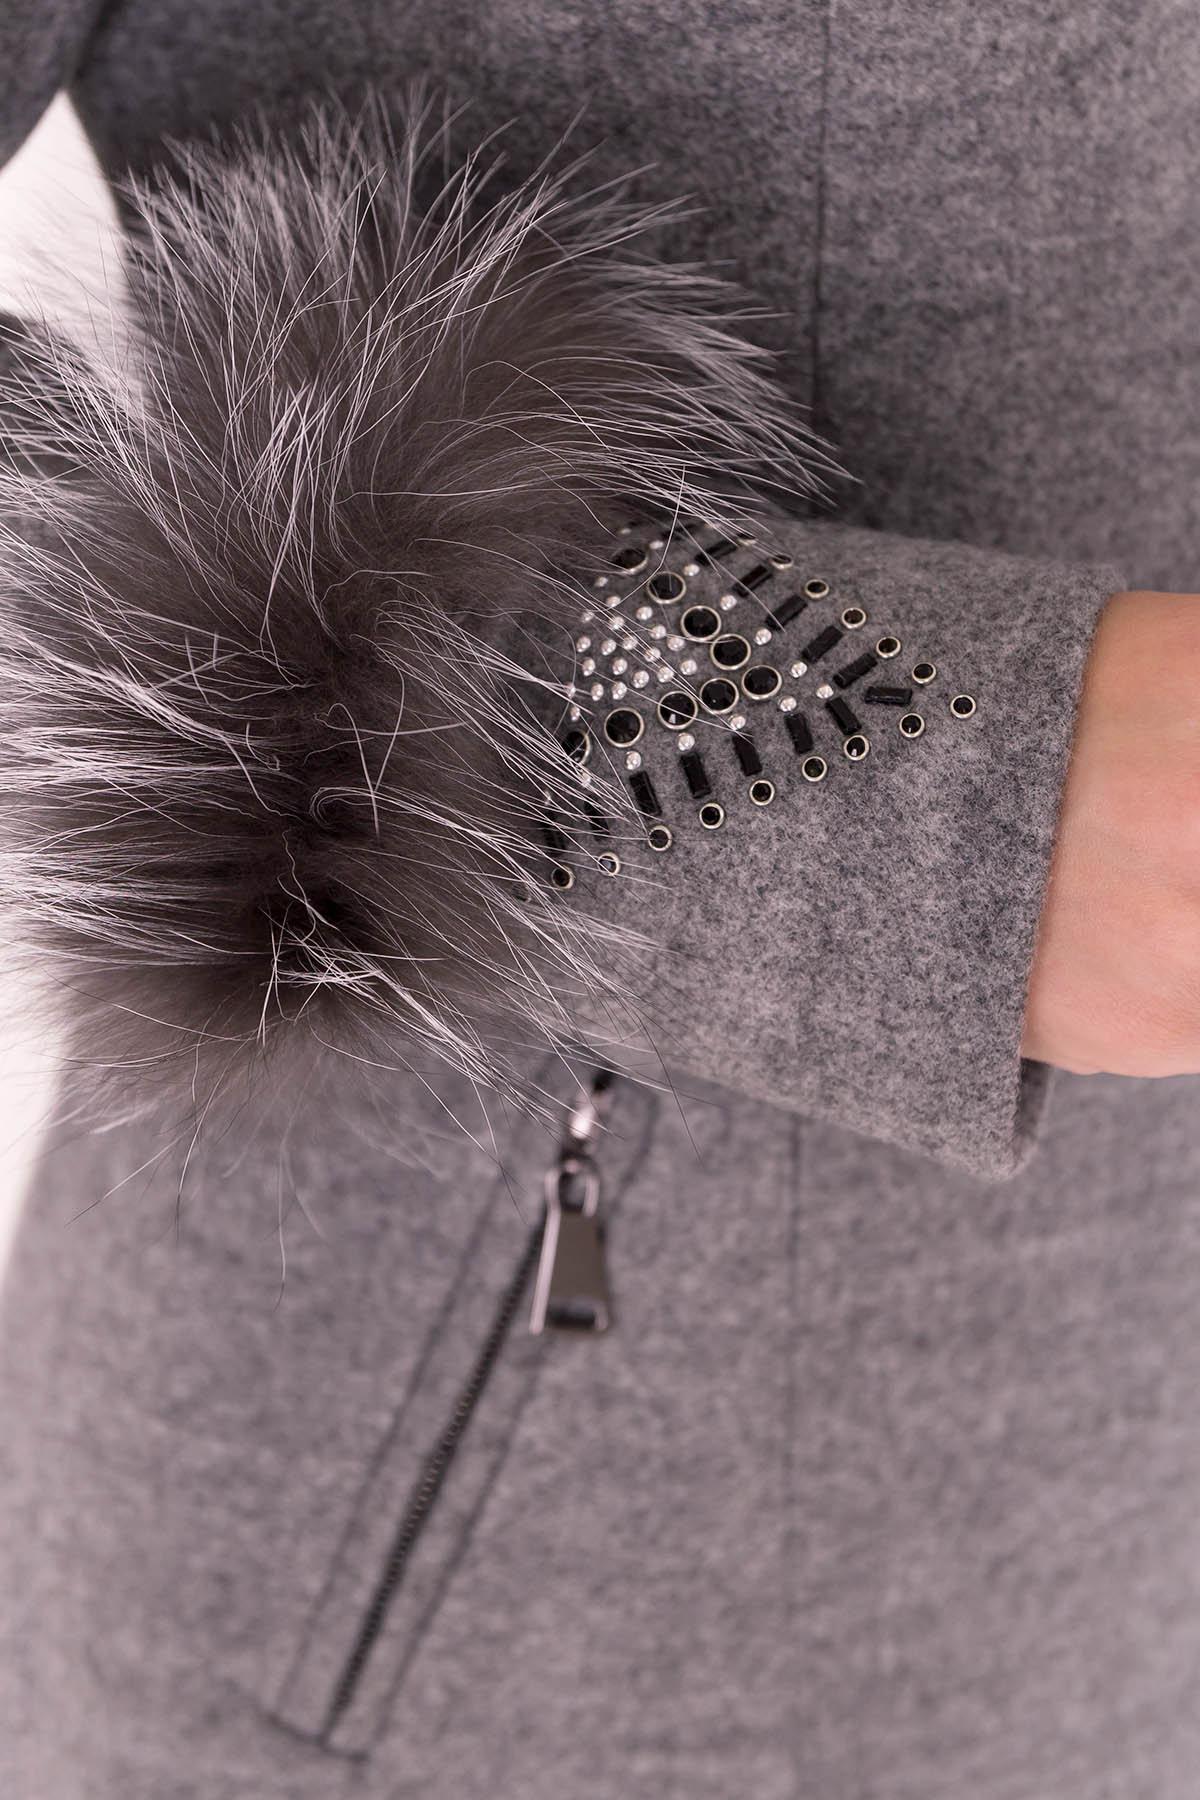 Пальто Лорин 4478 Цвет: Серый 18